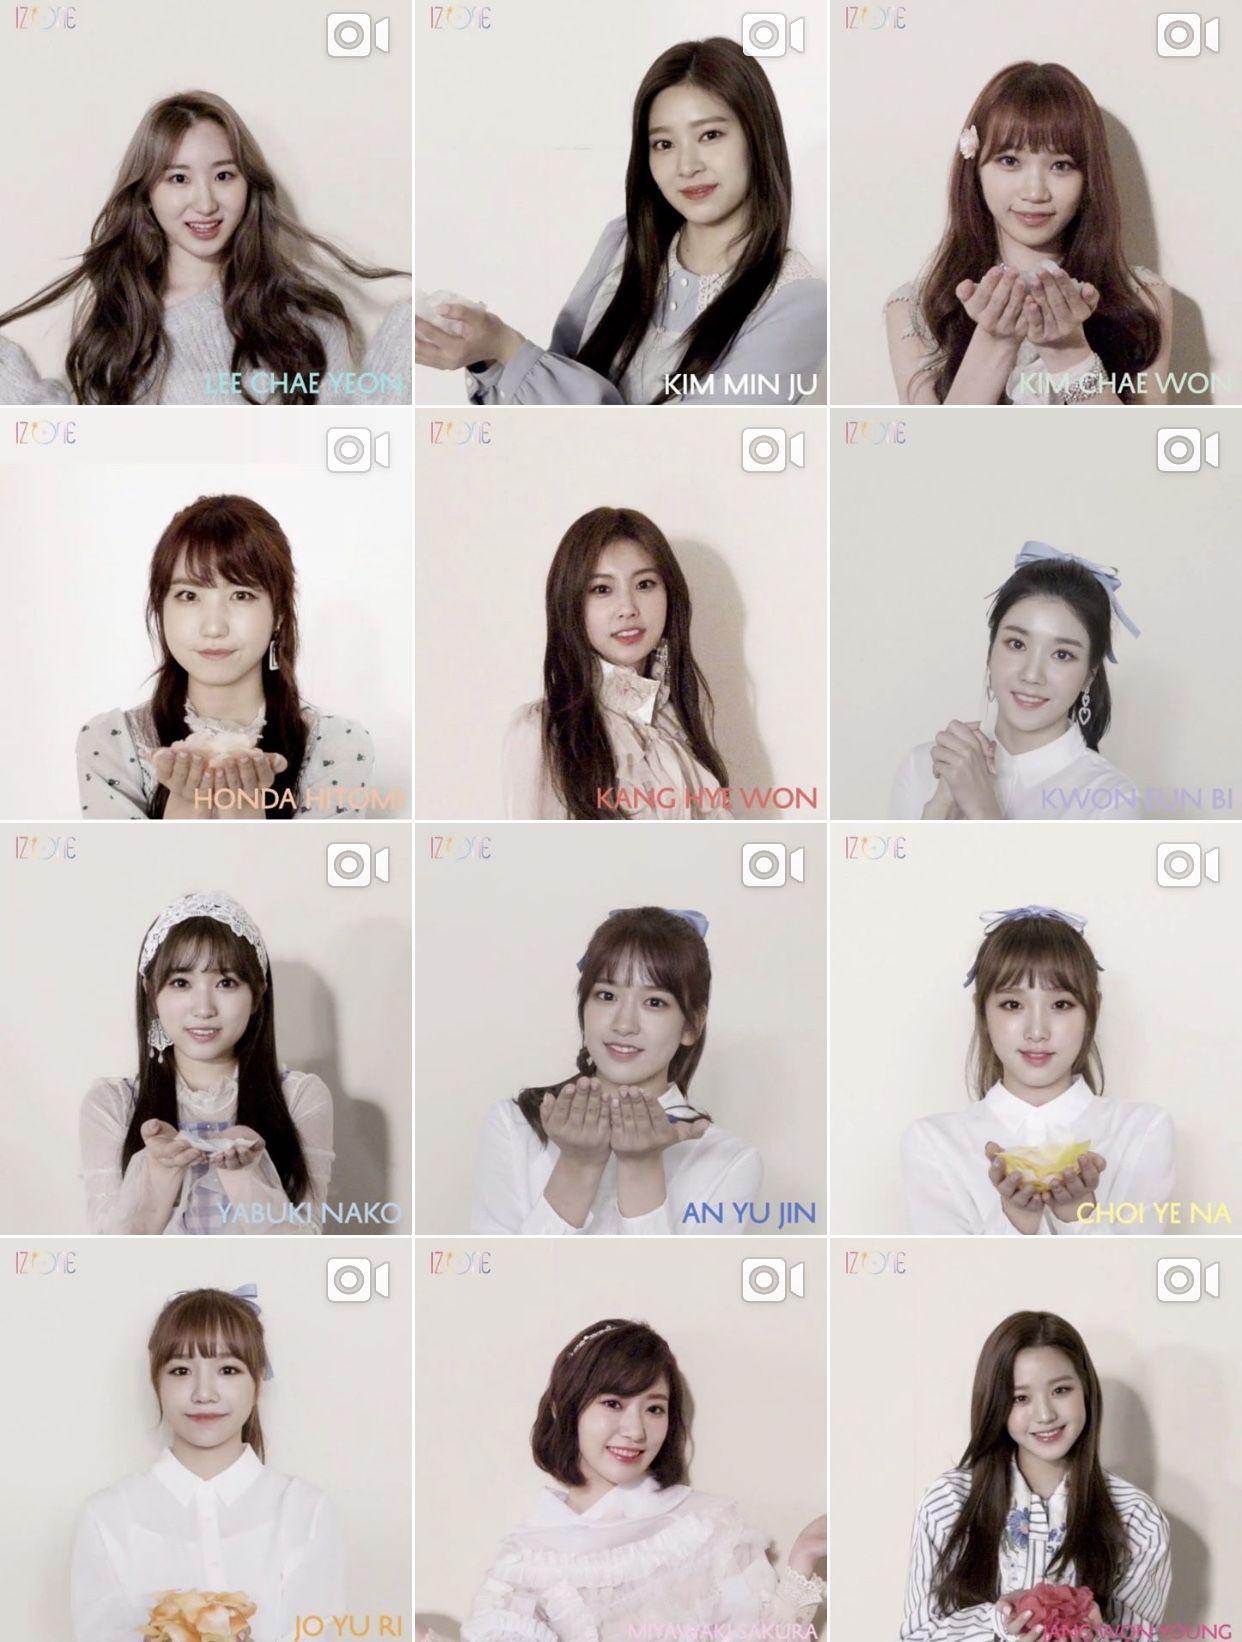 Iz One Lavieenrose Izone Kpop Girl Group Kpop Polaroid Film